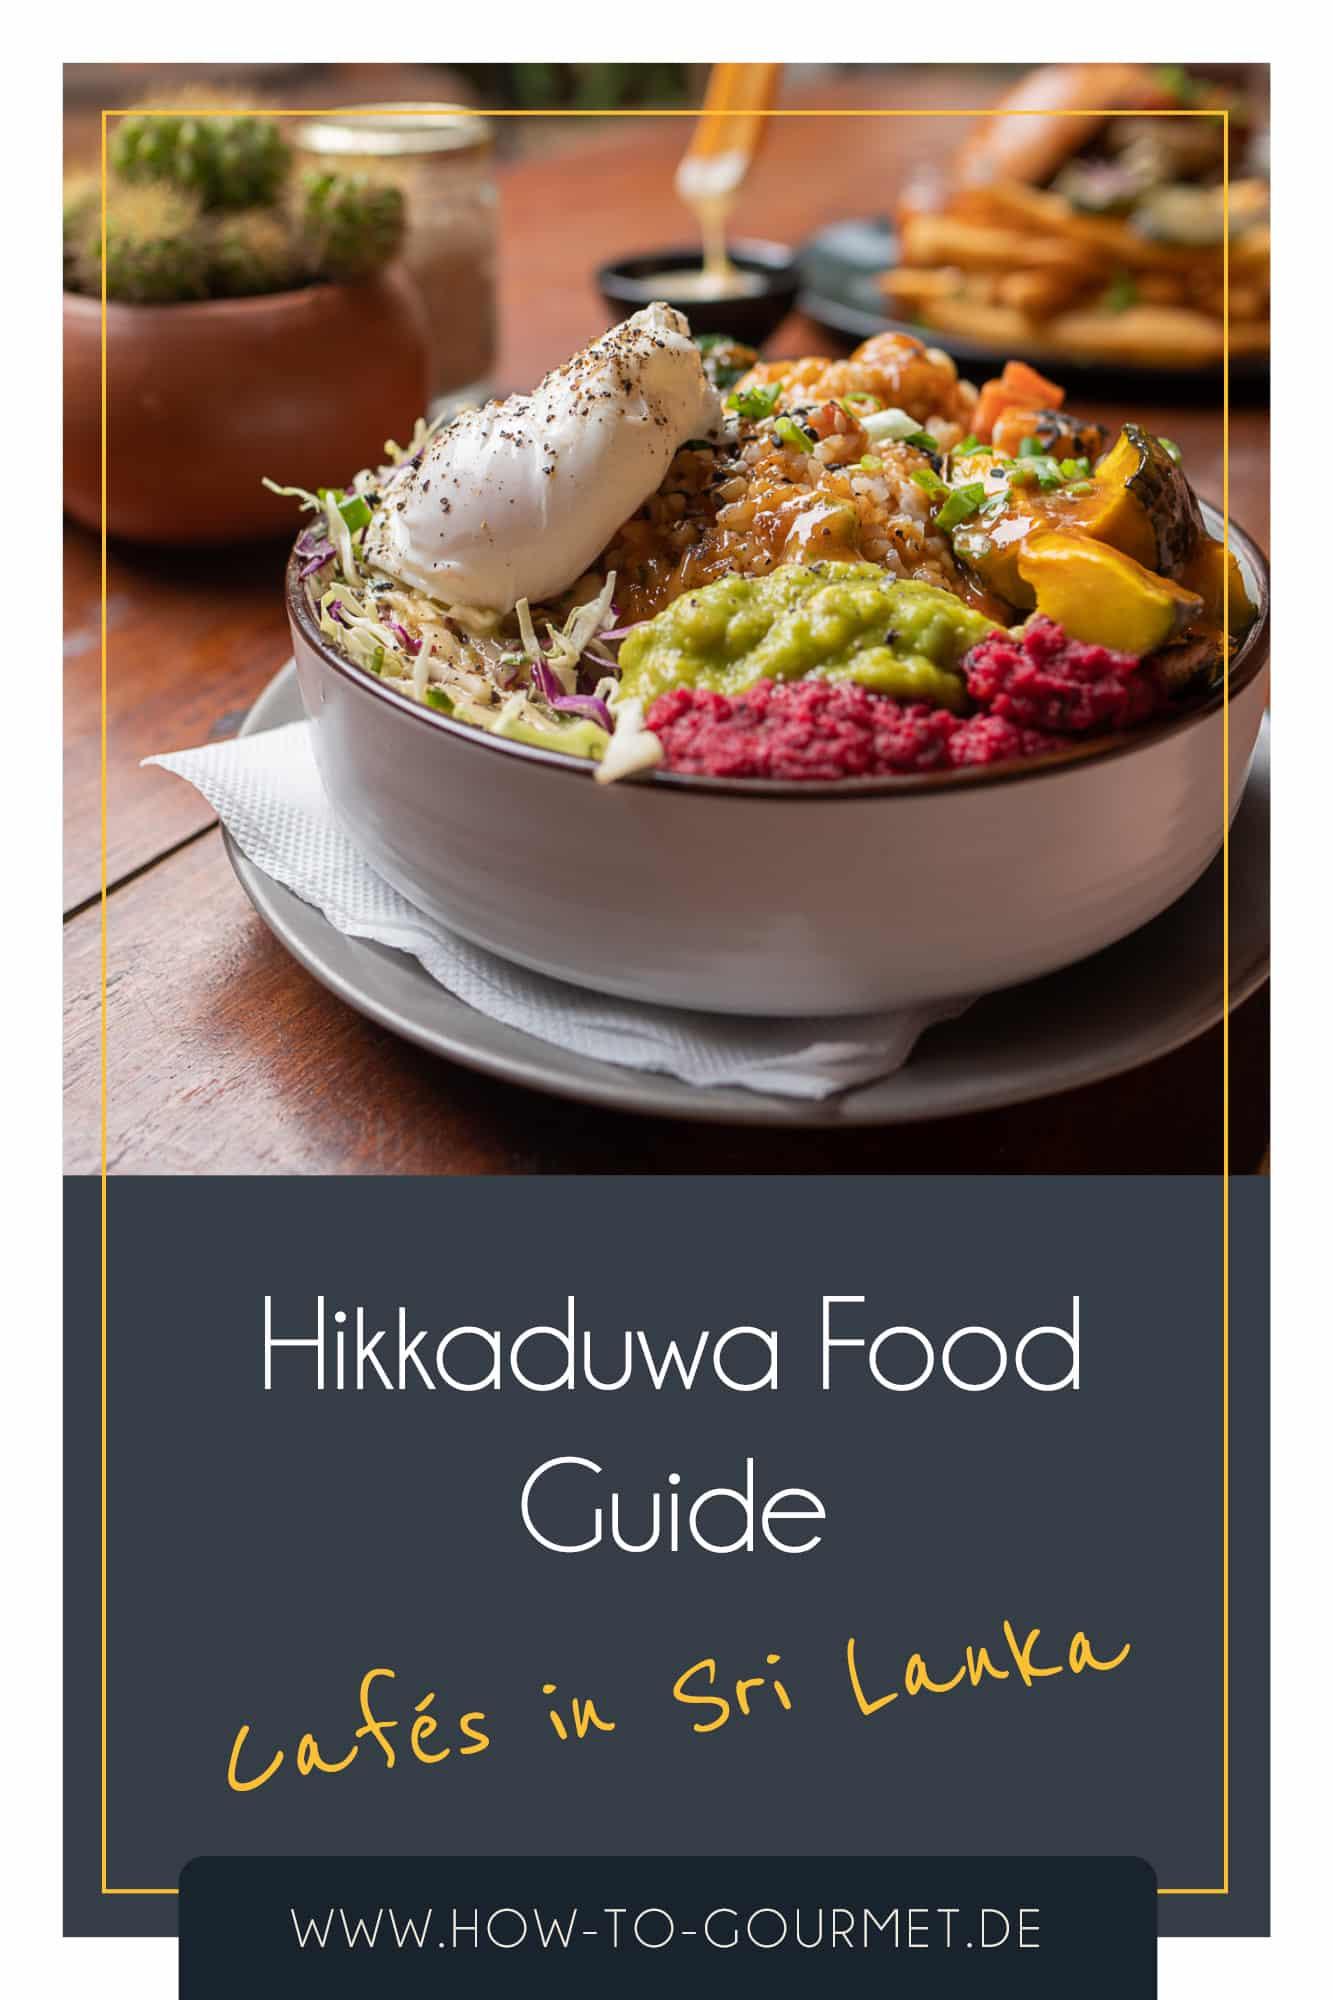 Food Guide Hikkaduwa